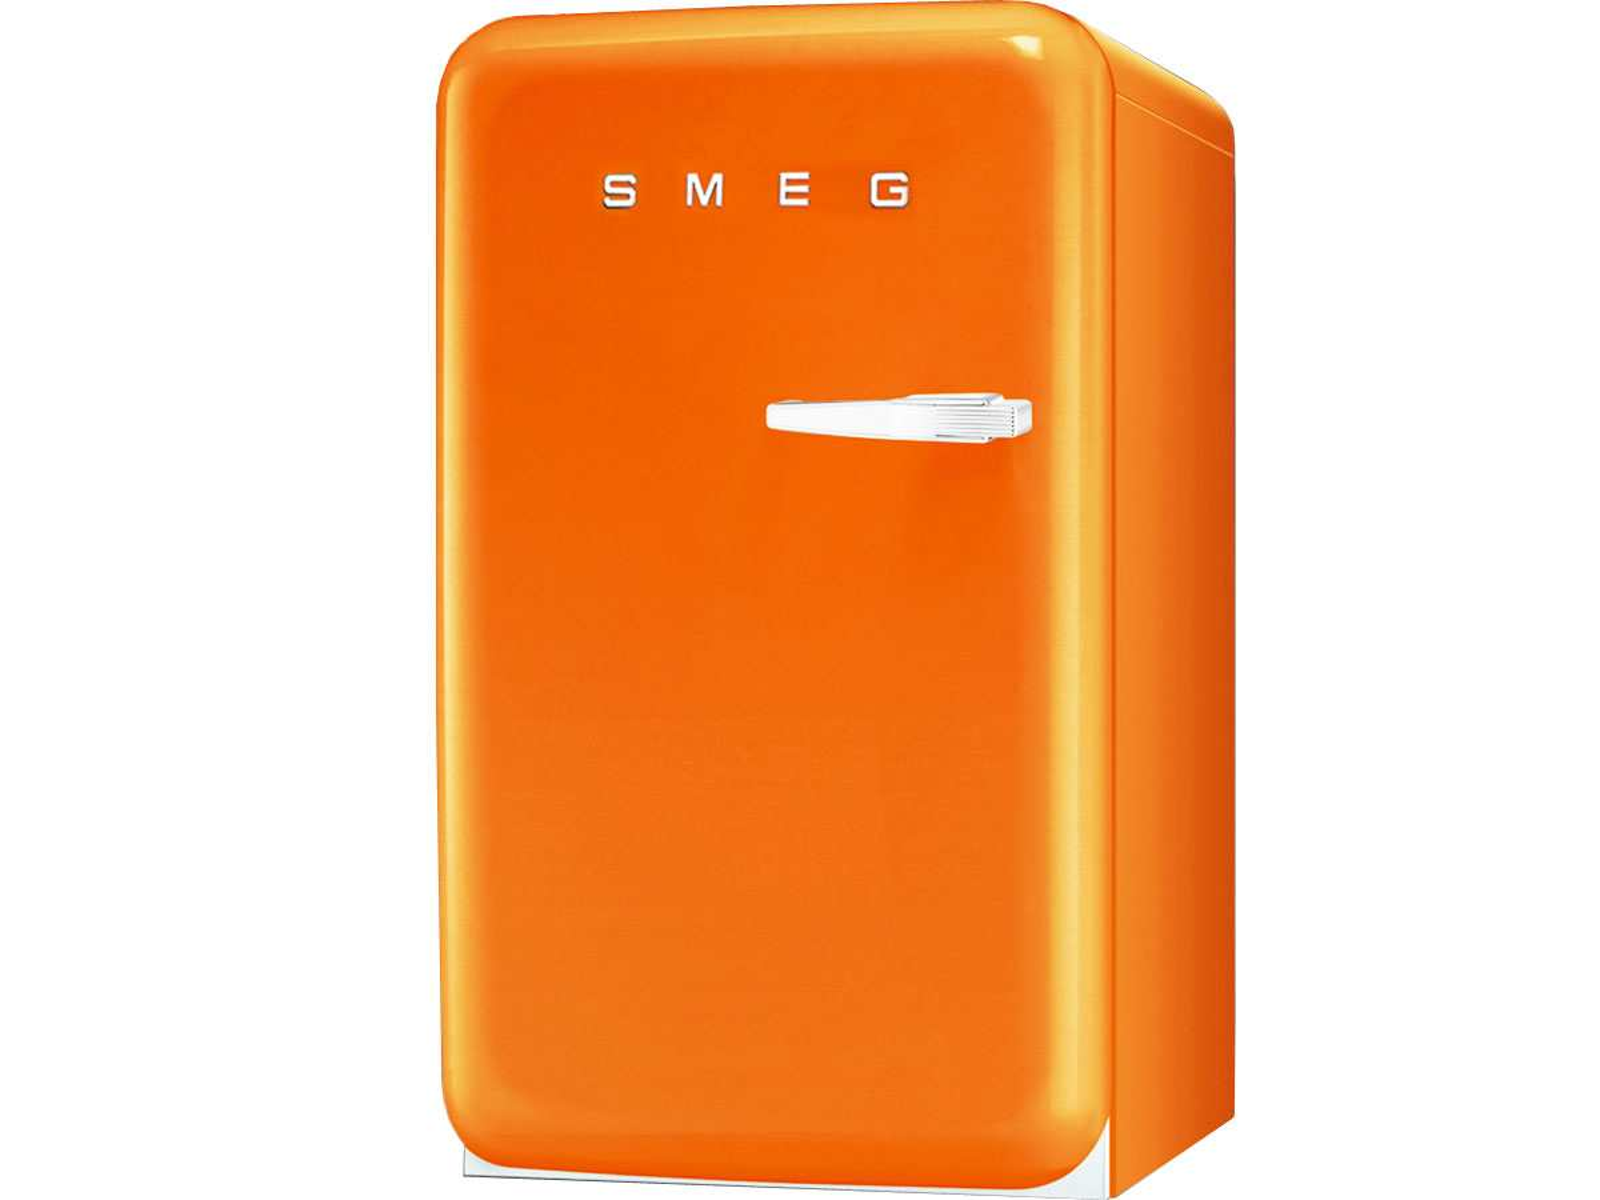 Smeg Kühlschrank Write On Me : Smeg kuehlschrank fab 10 smeg fab32ve7 stand kühl gefrier